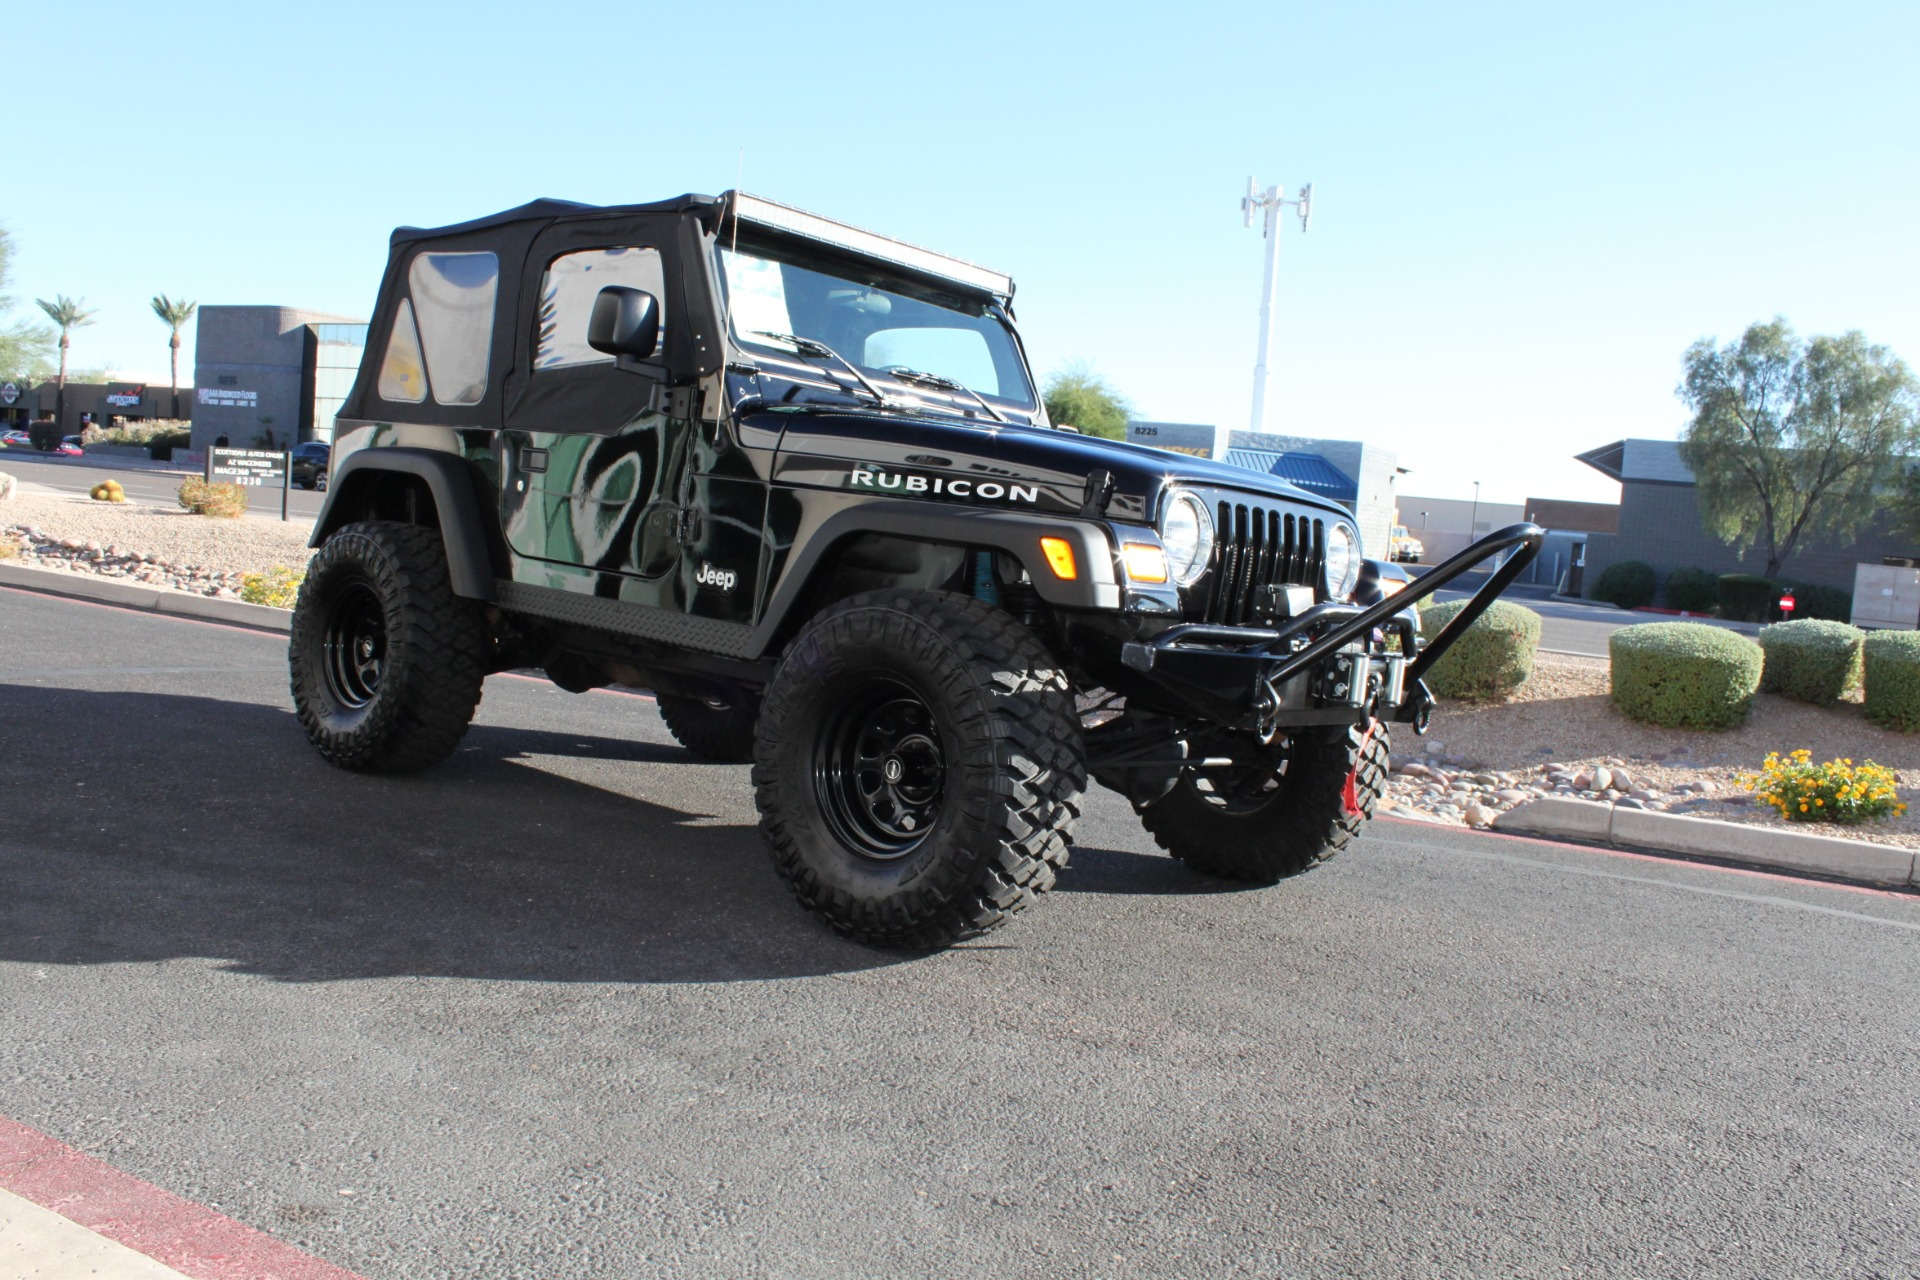 Used-2004-Jeep-Wrangler-Rubicon-Chevrolet